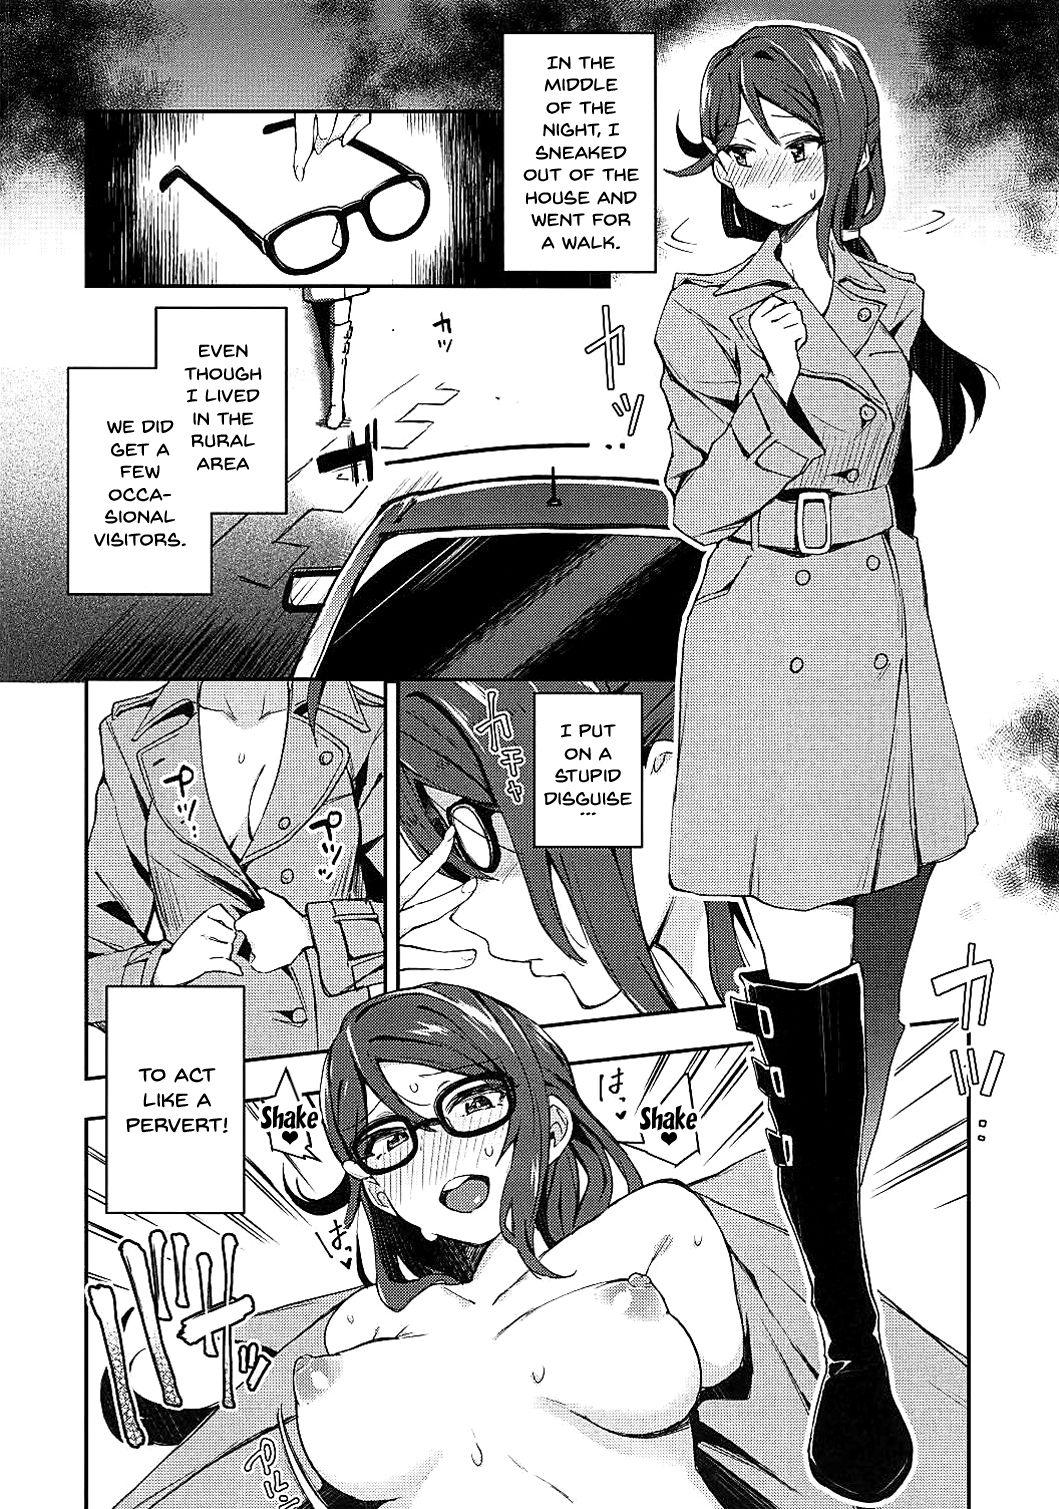 Ecchi Sketch Ro Ona Uchi. | The Lewd Girl Who Masturbates In Public 12